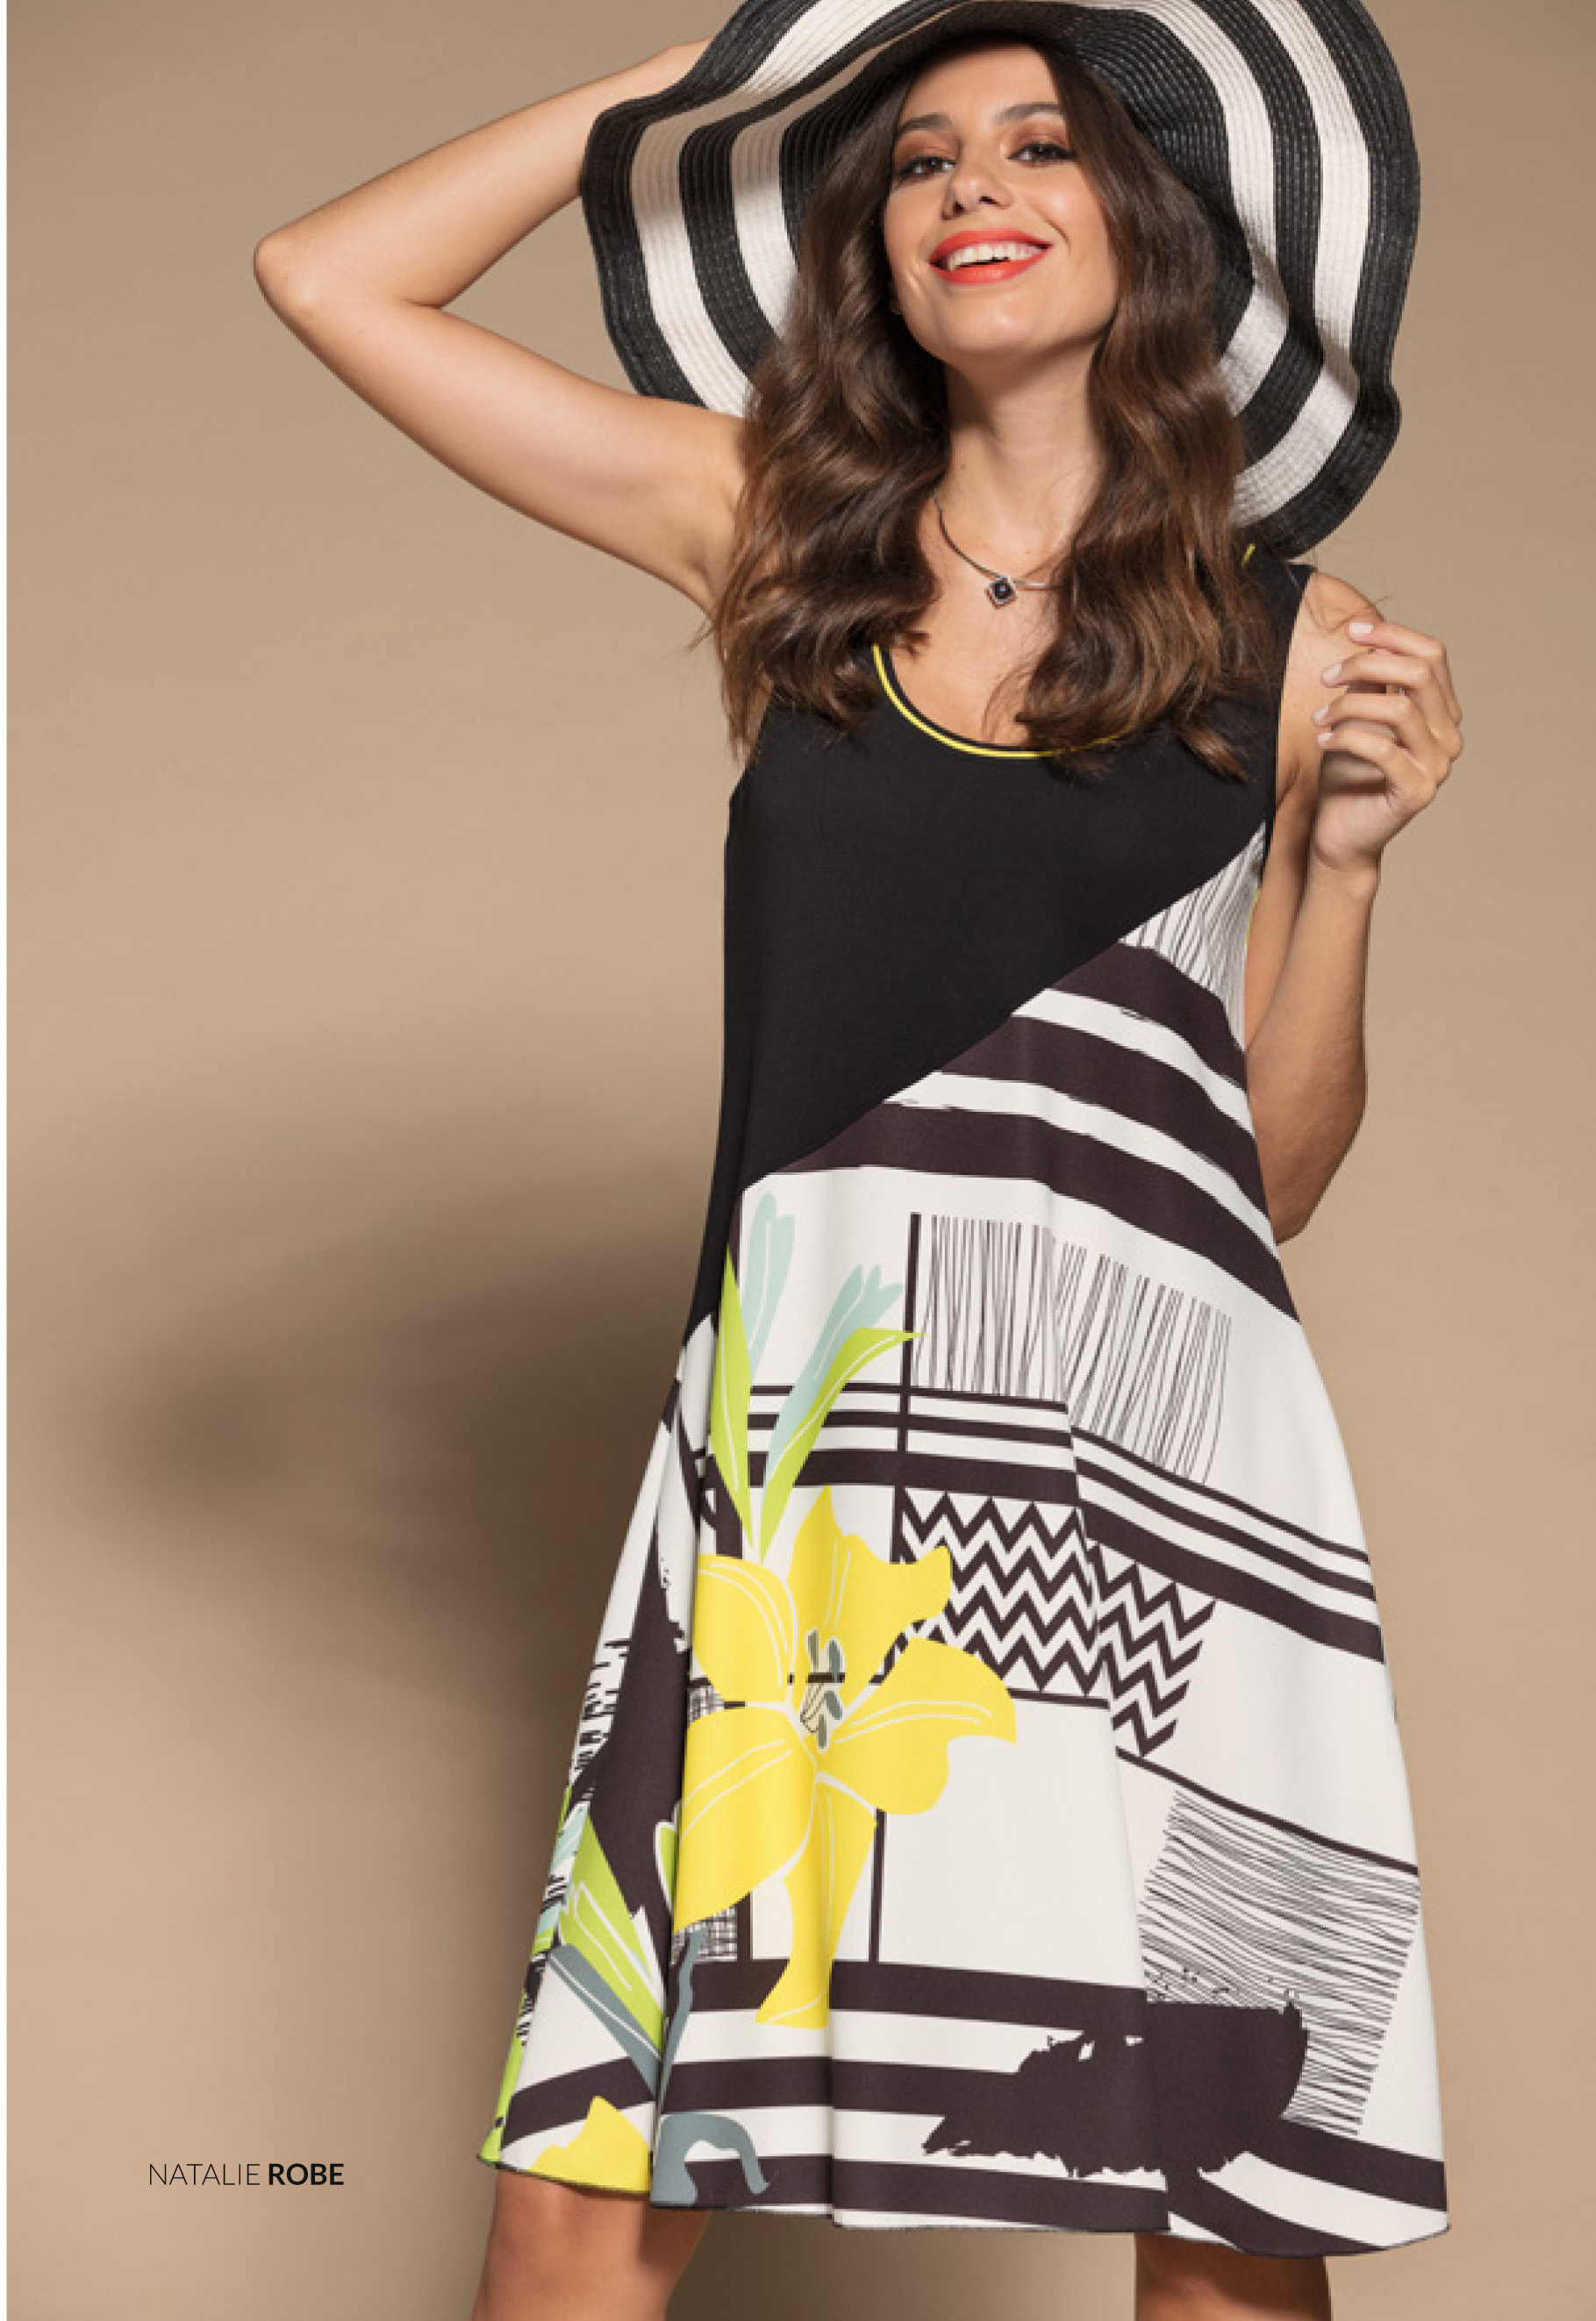 Maloka: Lemon Lime Marble Asymmetrical Bodice Dress/Tunic (Comes In 2 Art Patterns!) MK_NATALIE